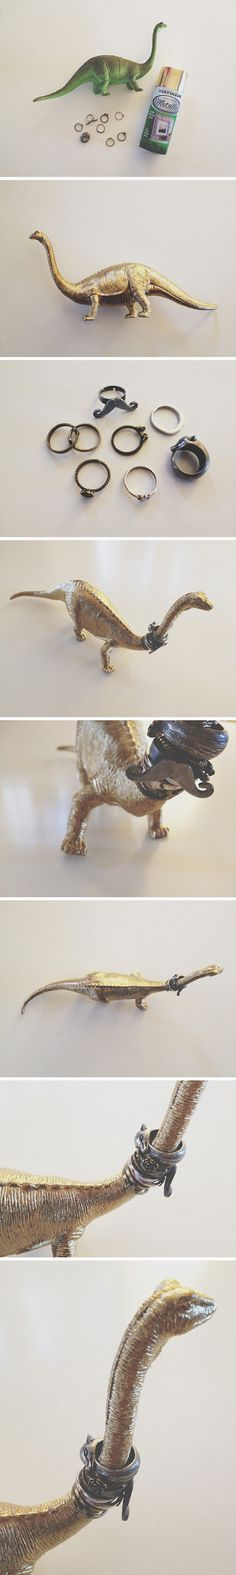 DIY plastic animal dinosaur ring holder. #spray paint...want to do with an elephant!